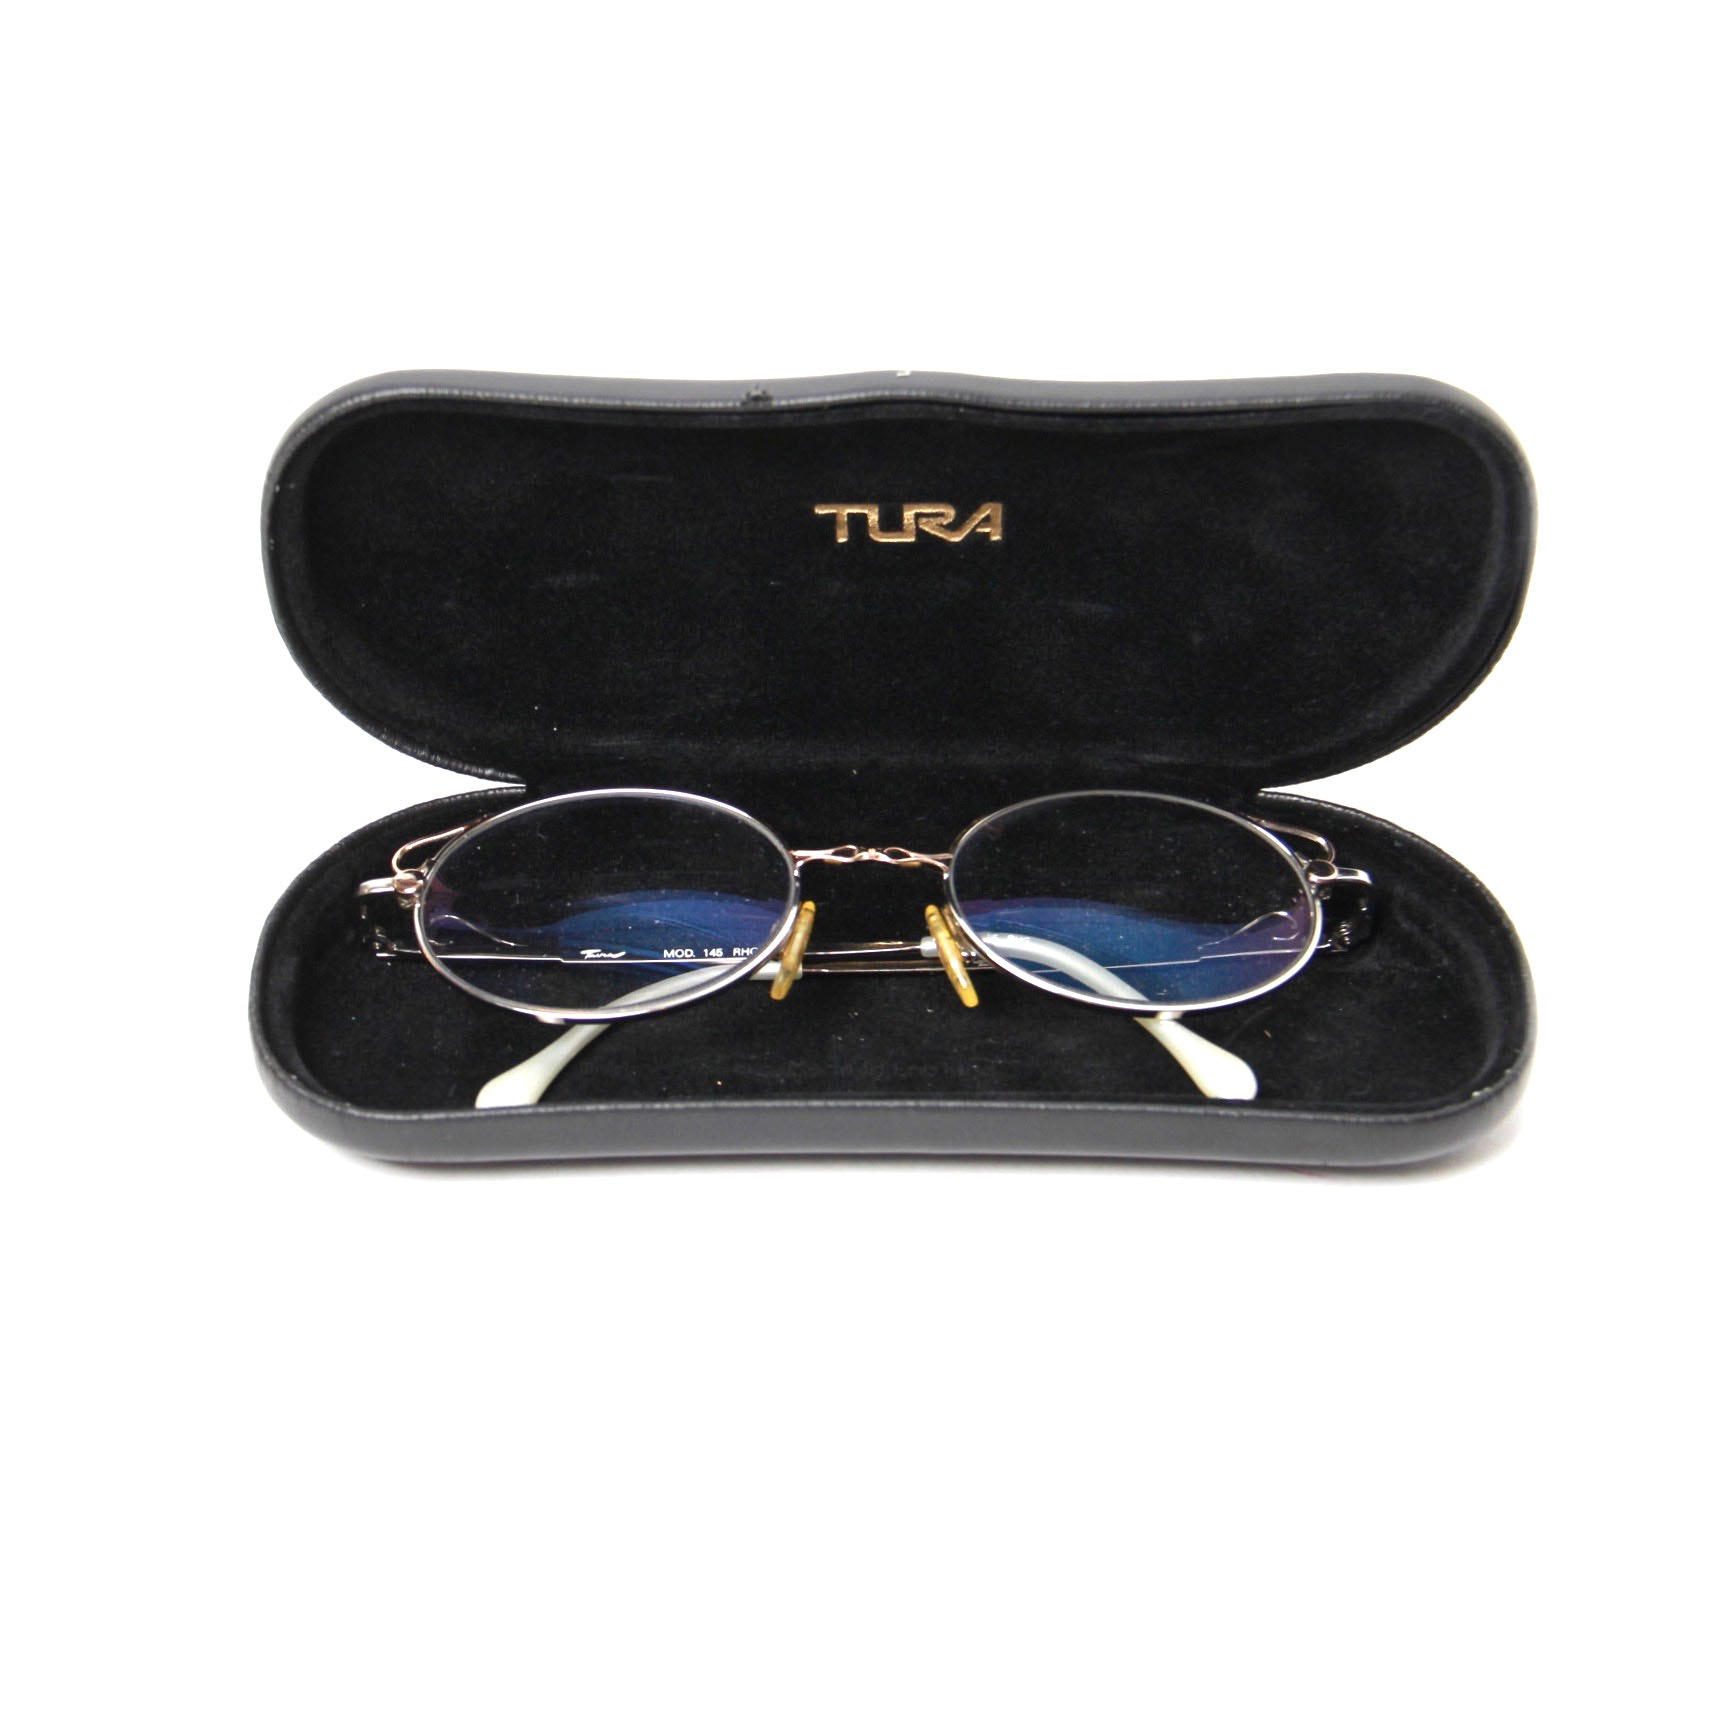 Tura Bifocal Women's Eyeglasses